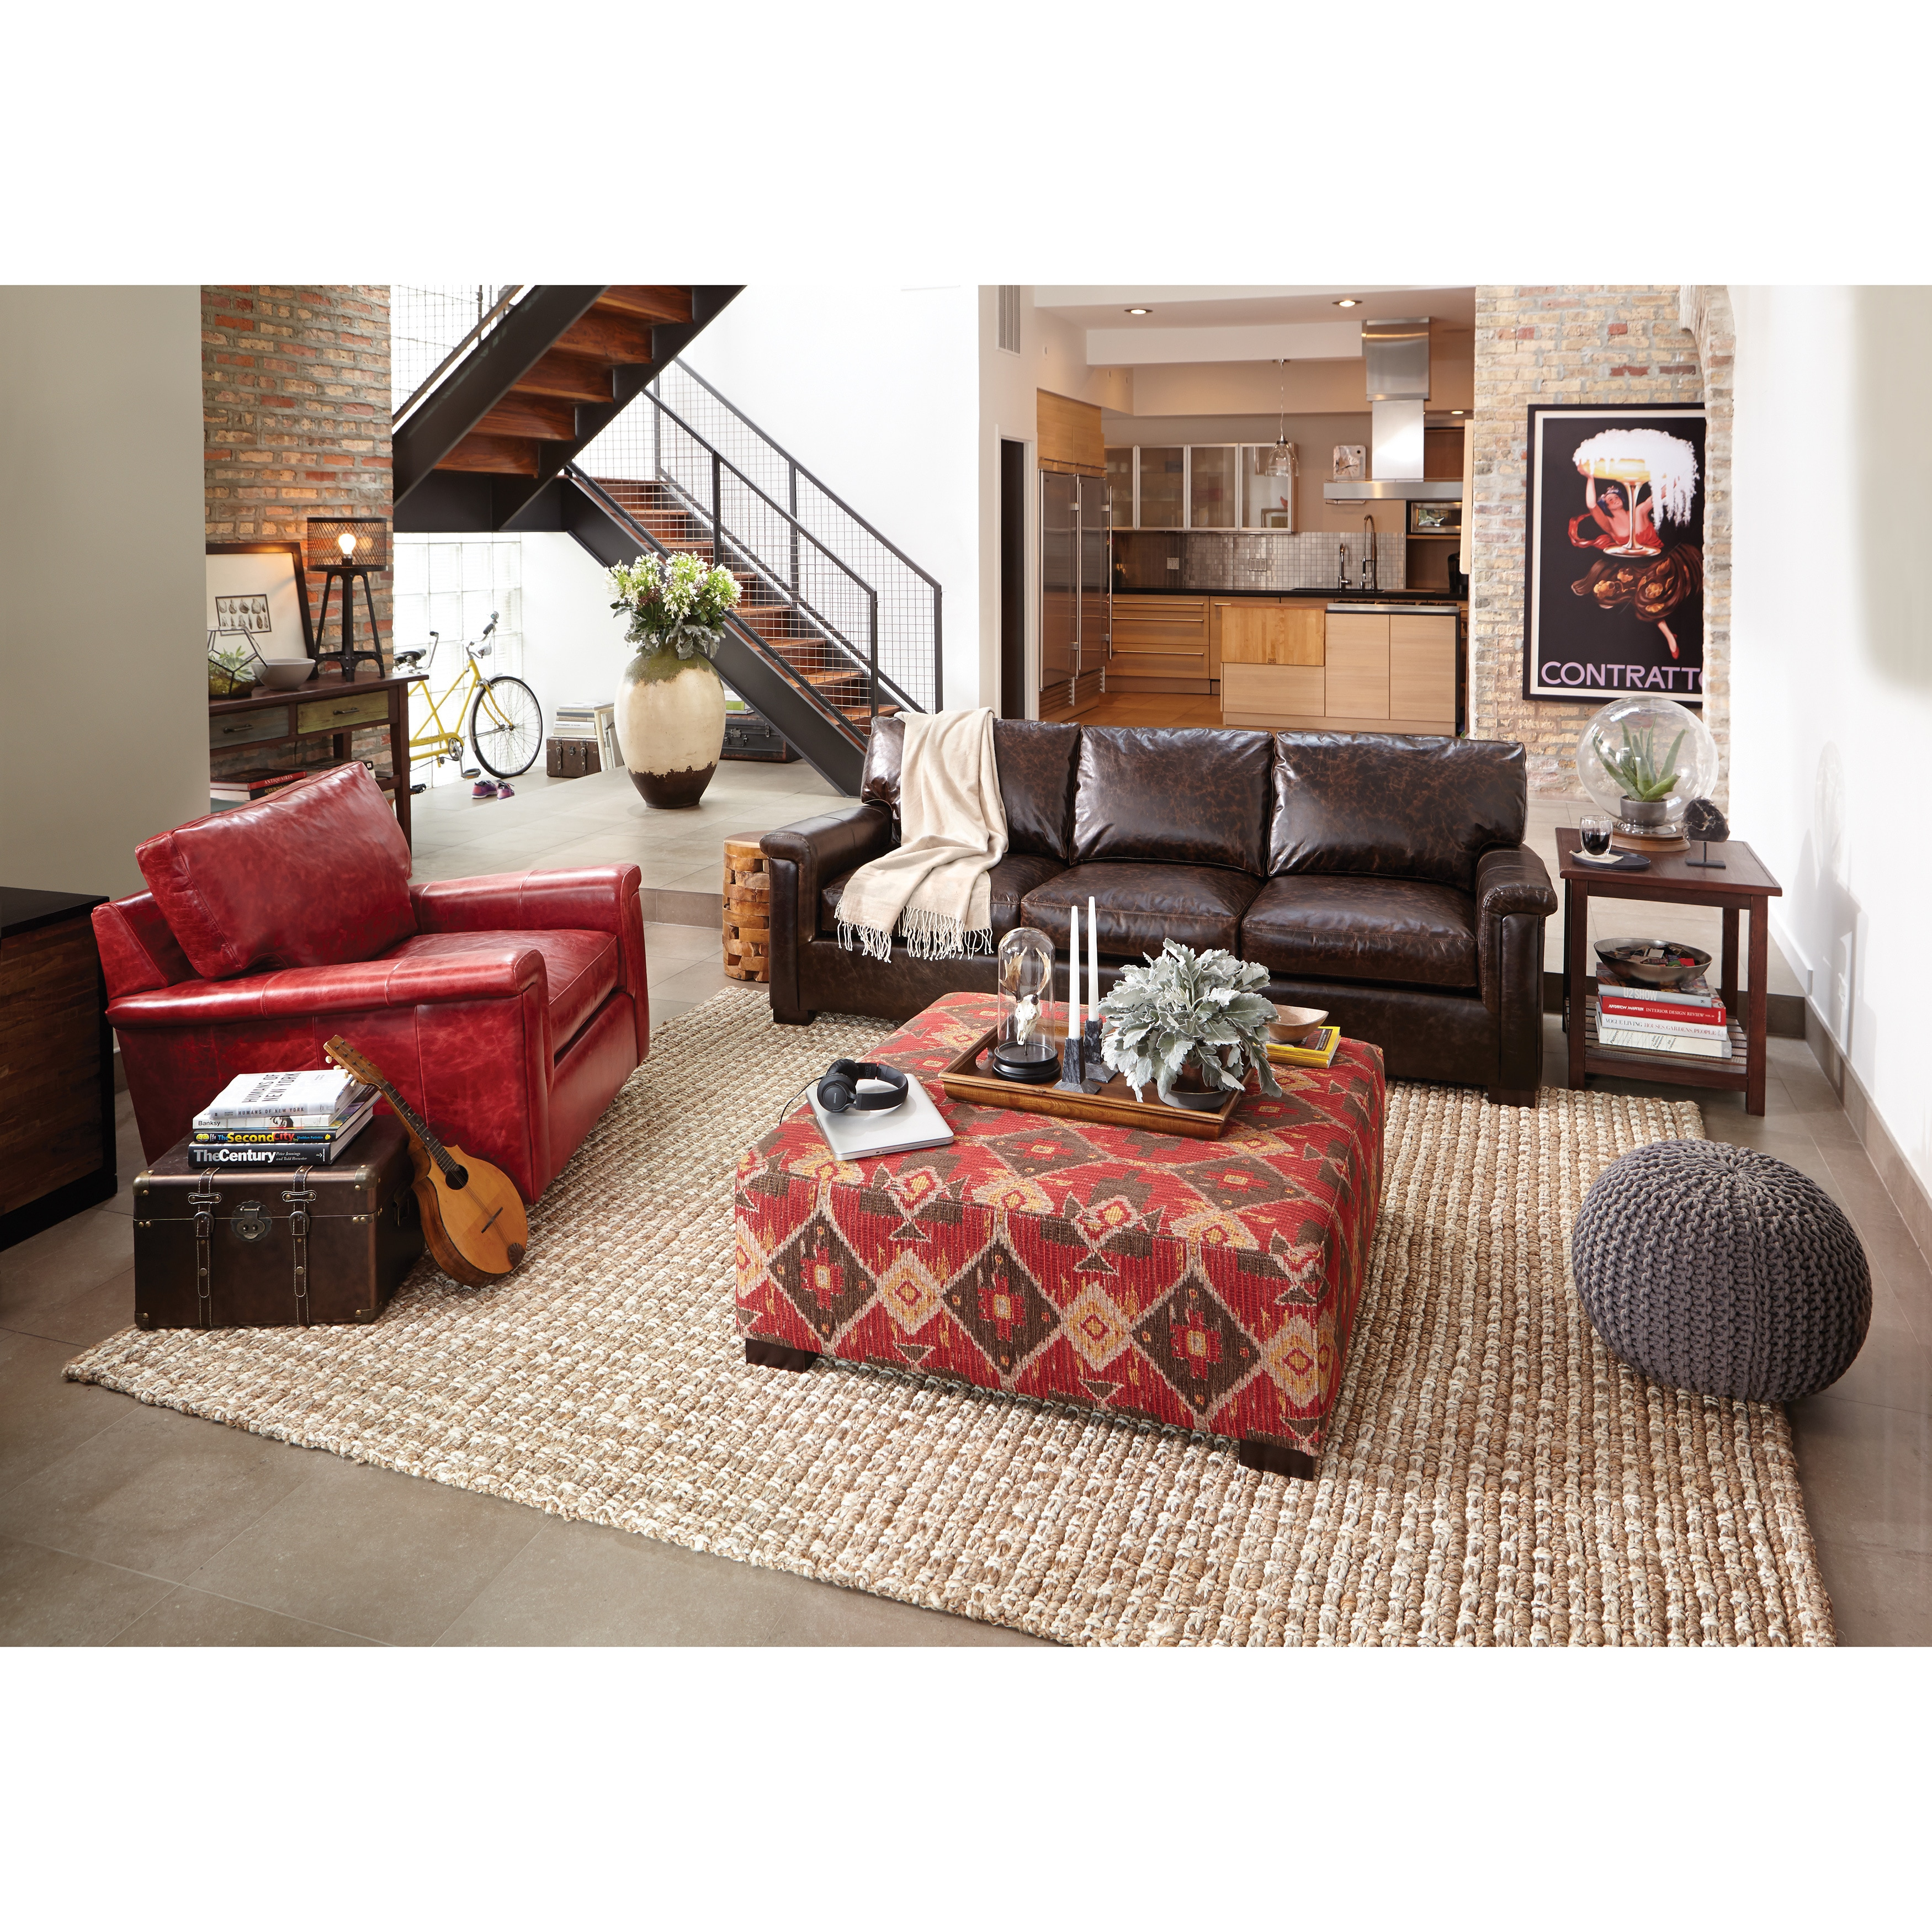 Art Van Foley 96-inch Sofa